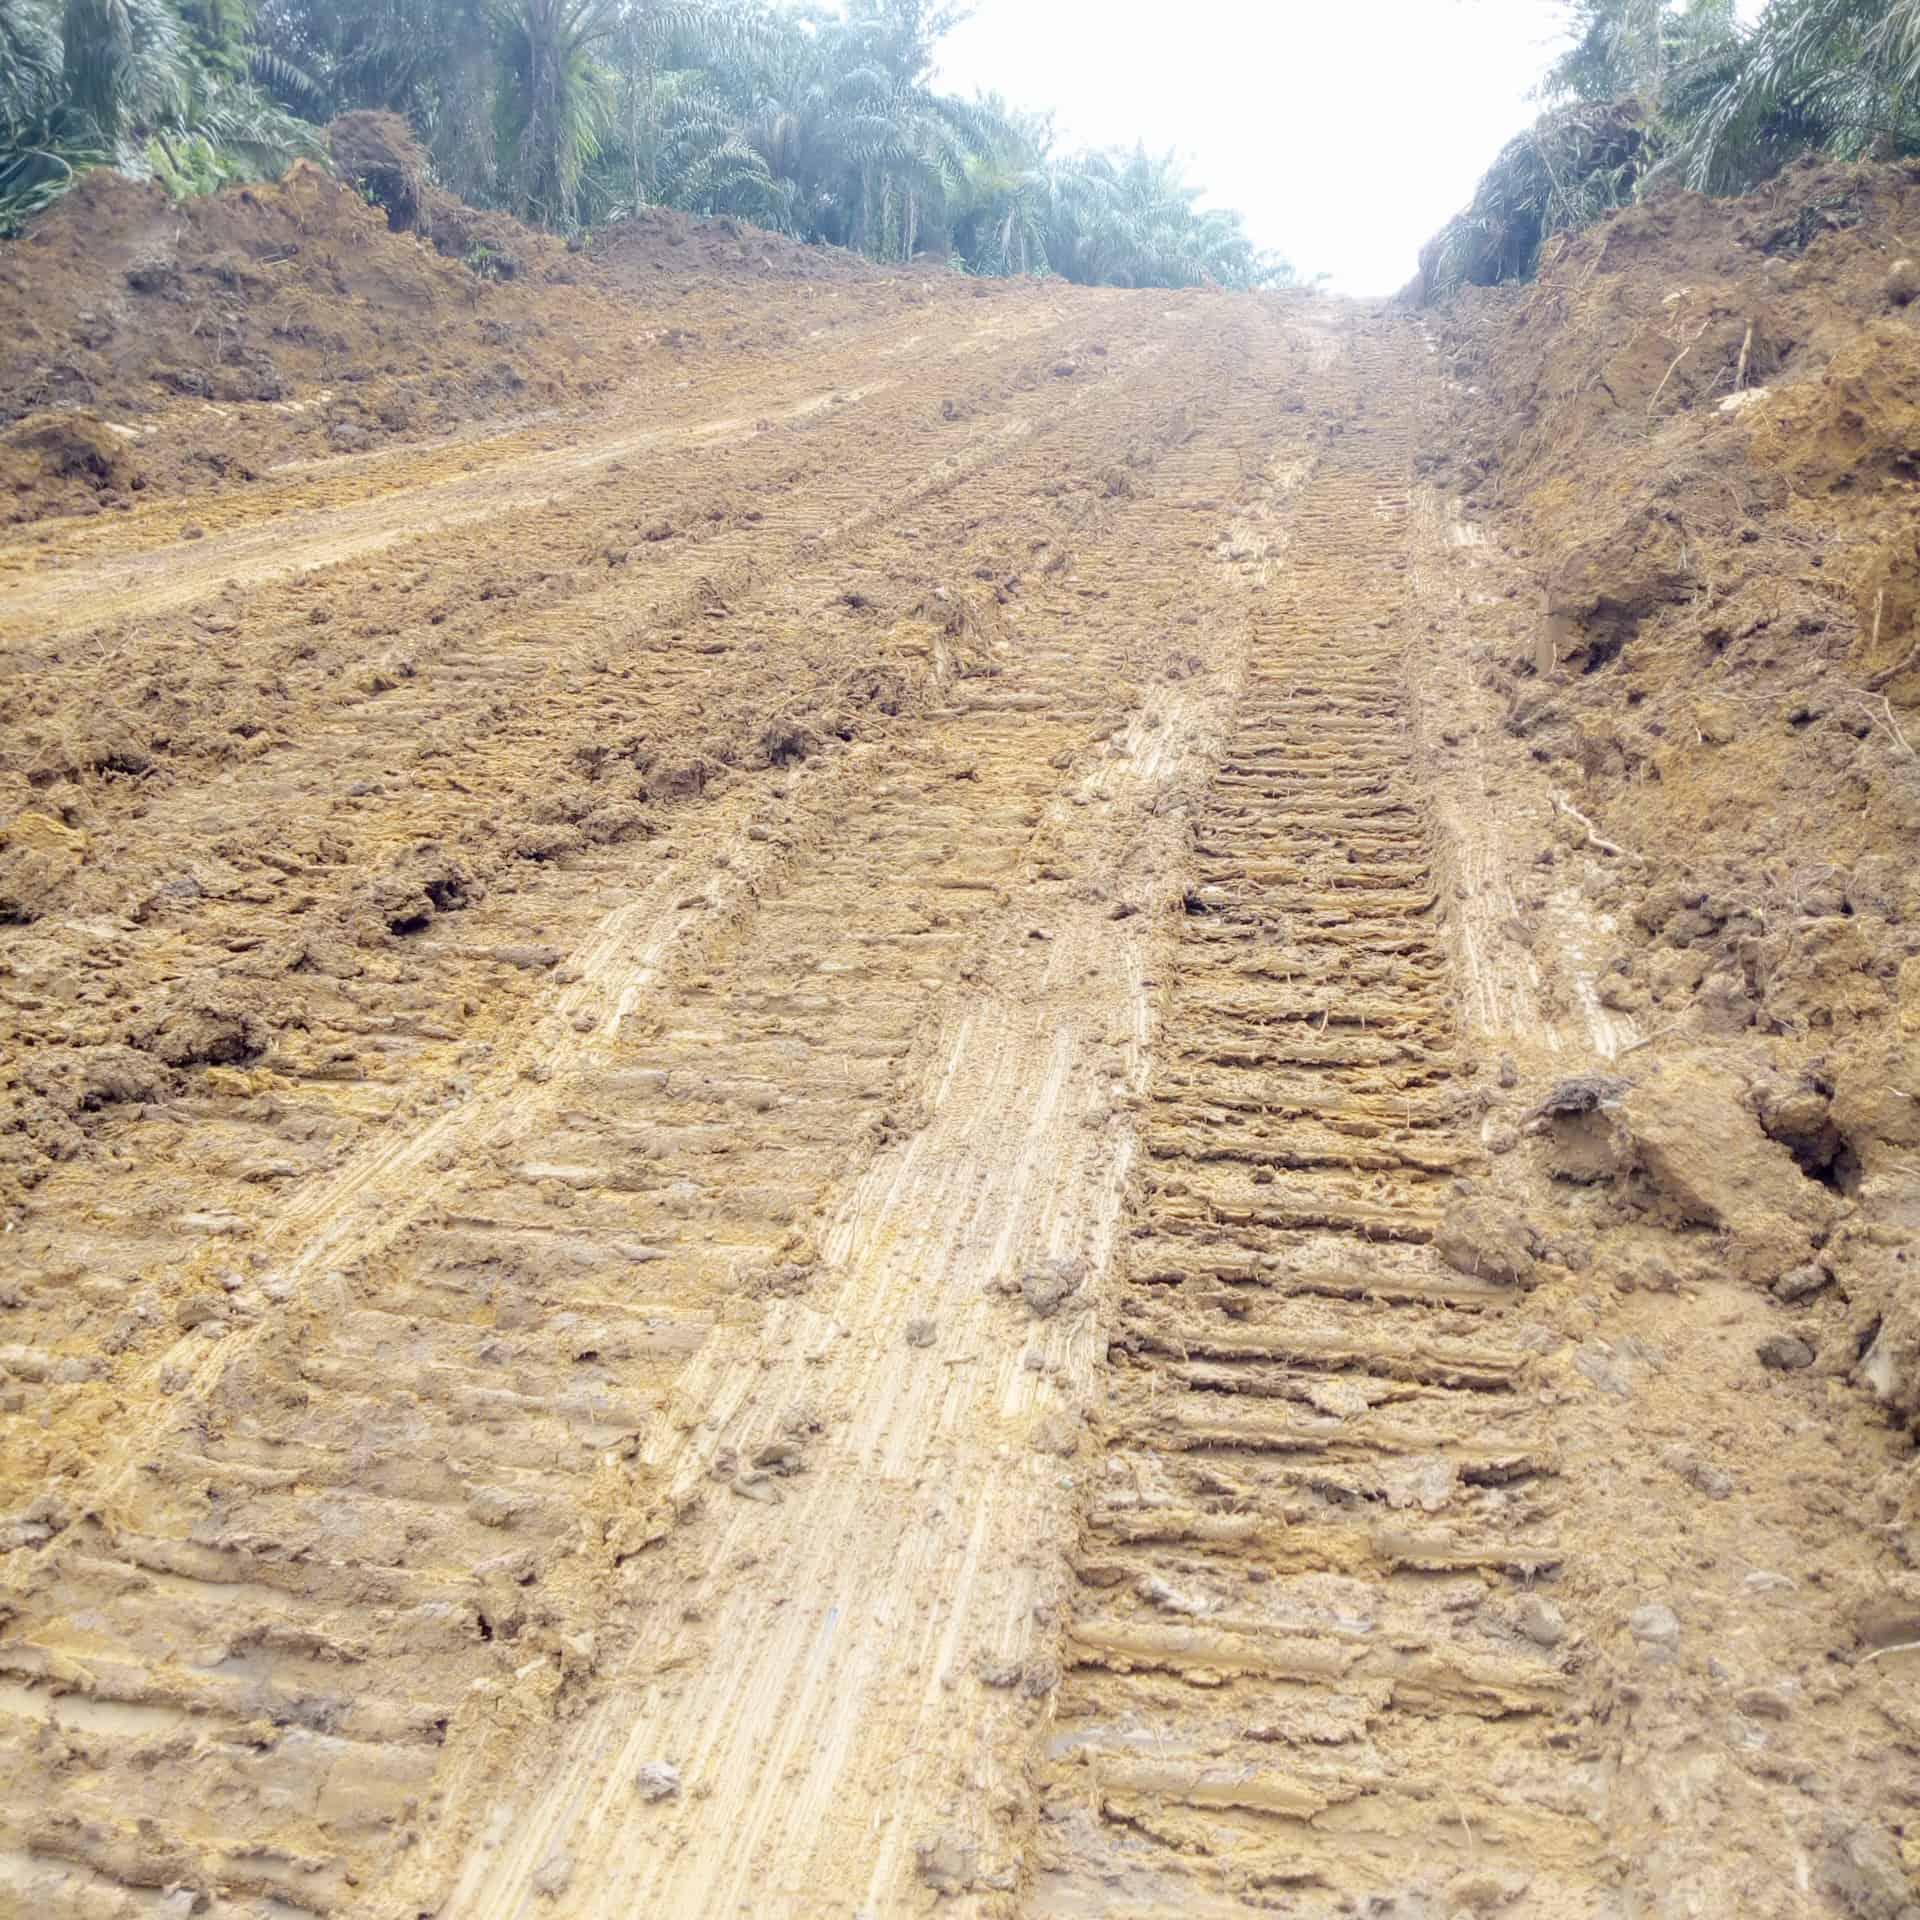 Land for sale at Douala, Bassa, Pk31 - 200000 m2 - 50 000 000 FCFA